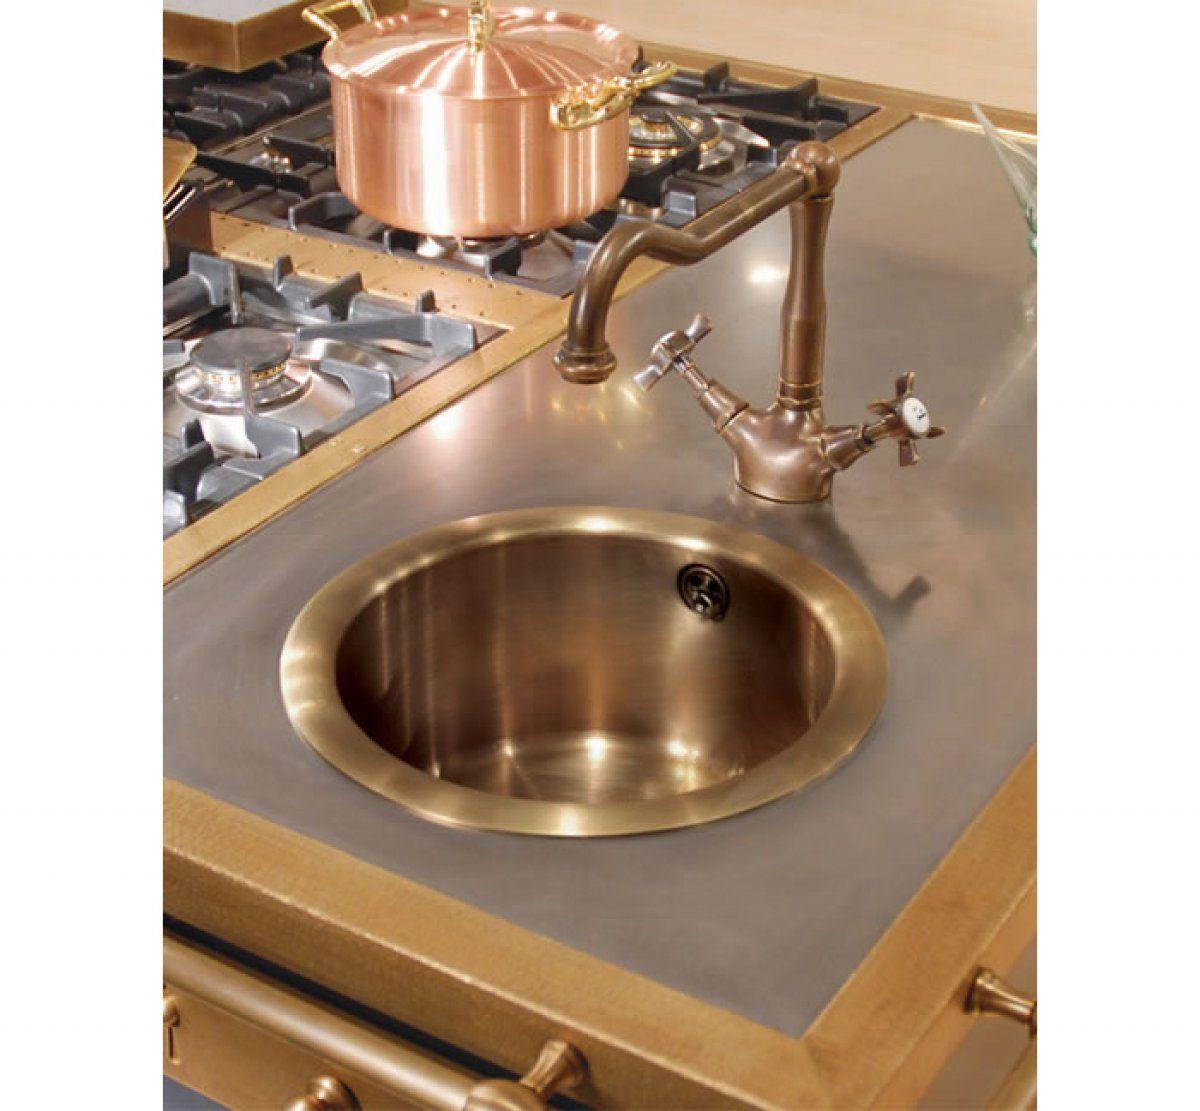 Collezione lavelli per cucina restart srl firenze for Restart cucine